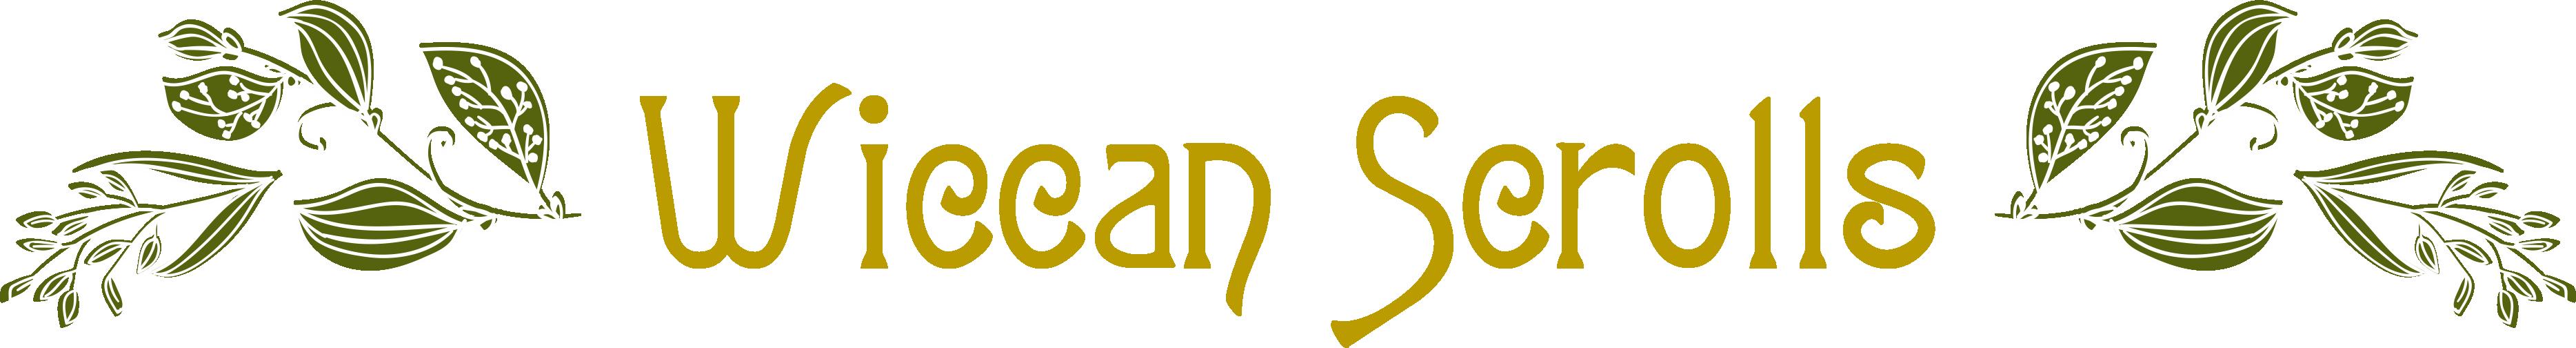 Wiccan Scrolls